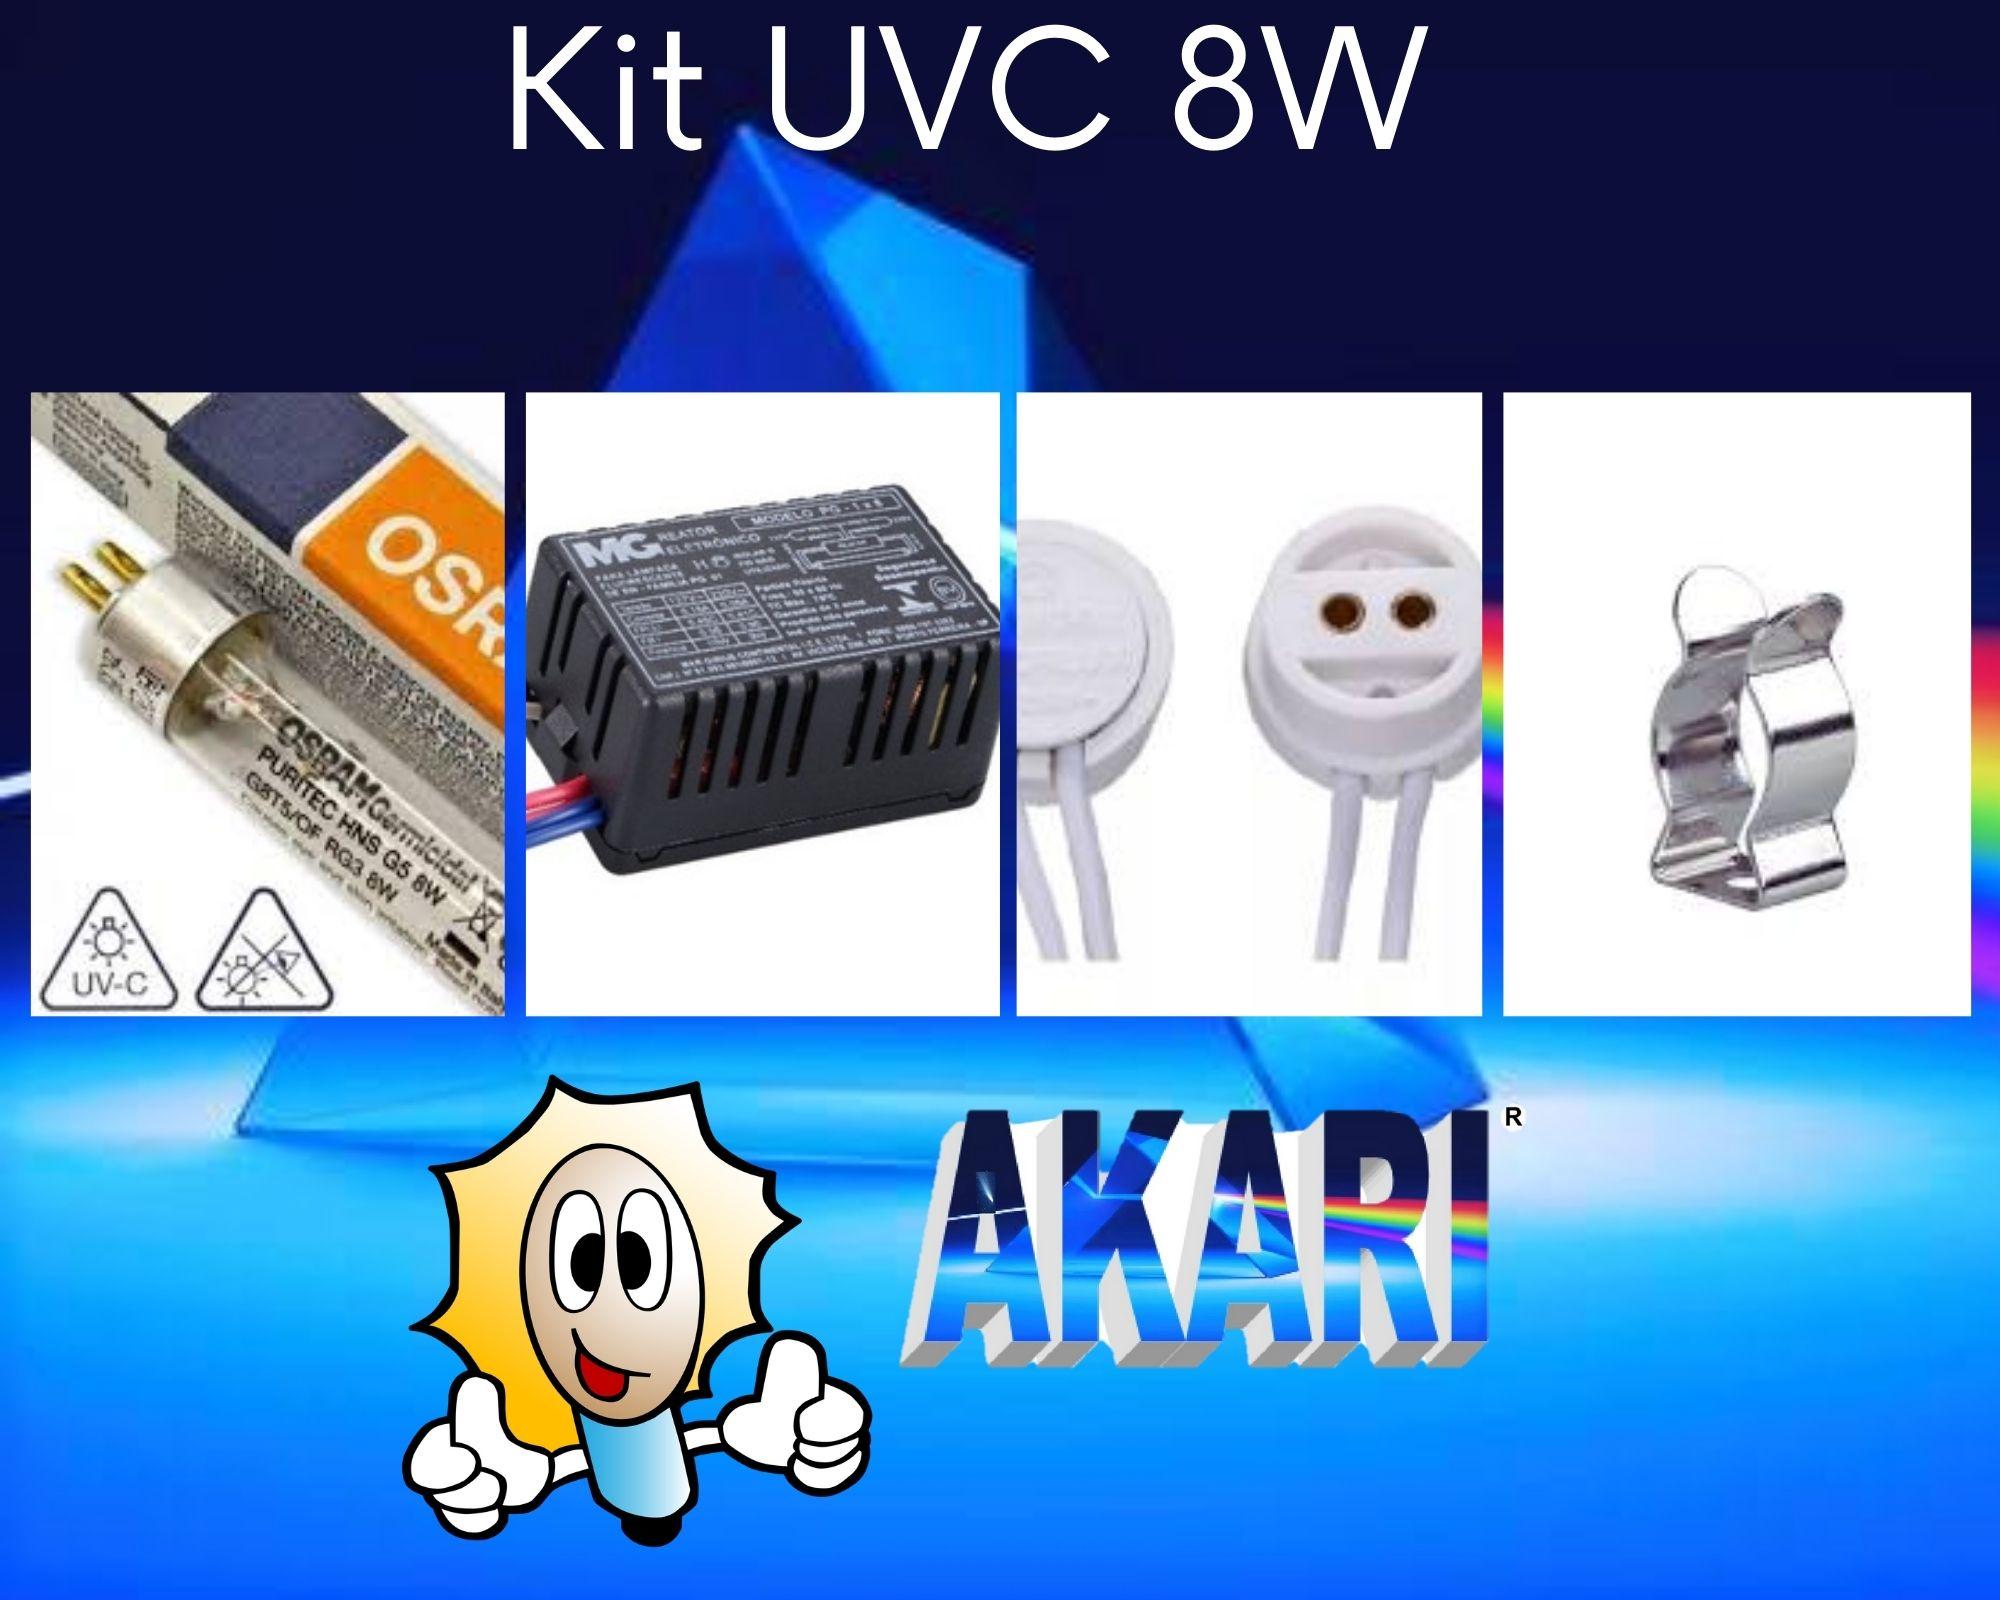 Kit UVC  8W, Lâmpada HNS 8W + Reator + Abraçadeira + Soquete